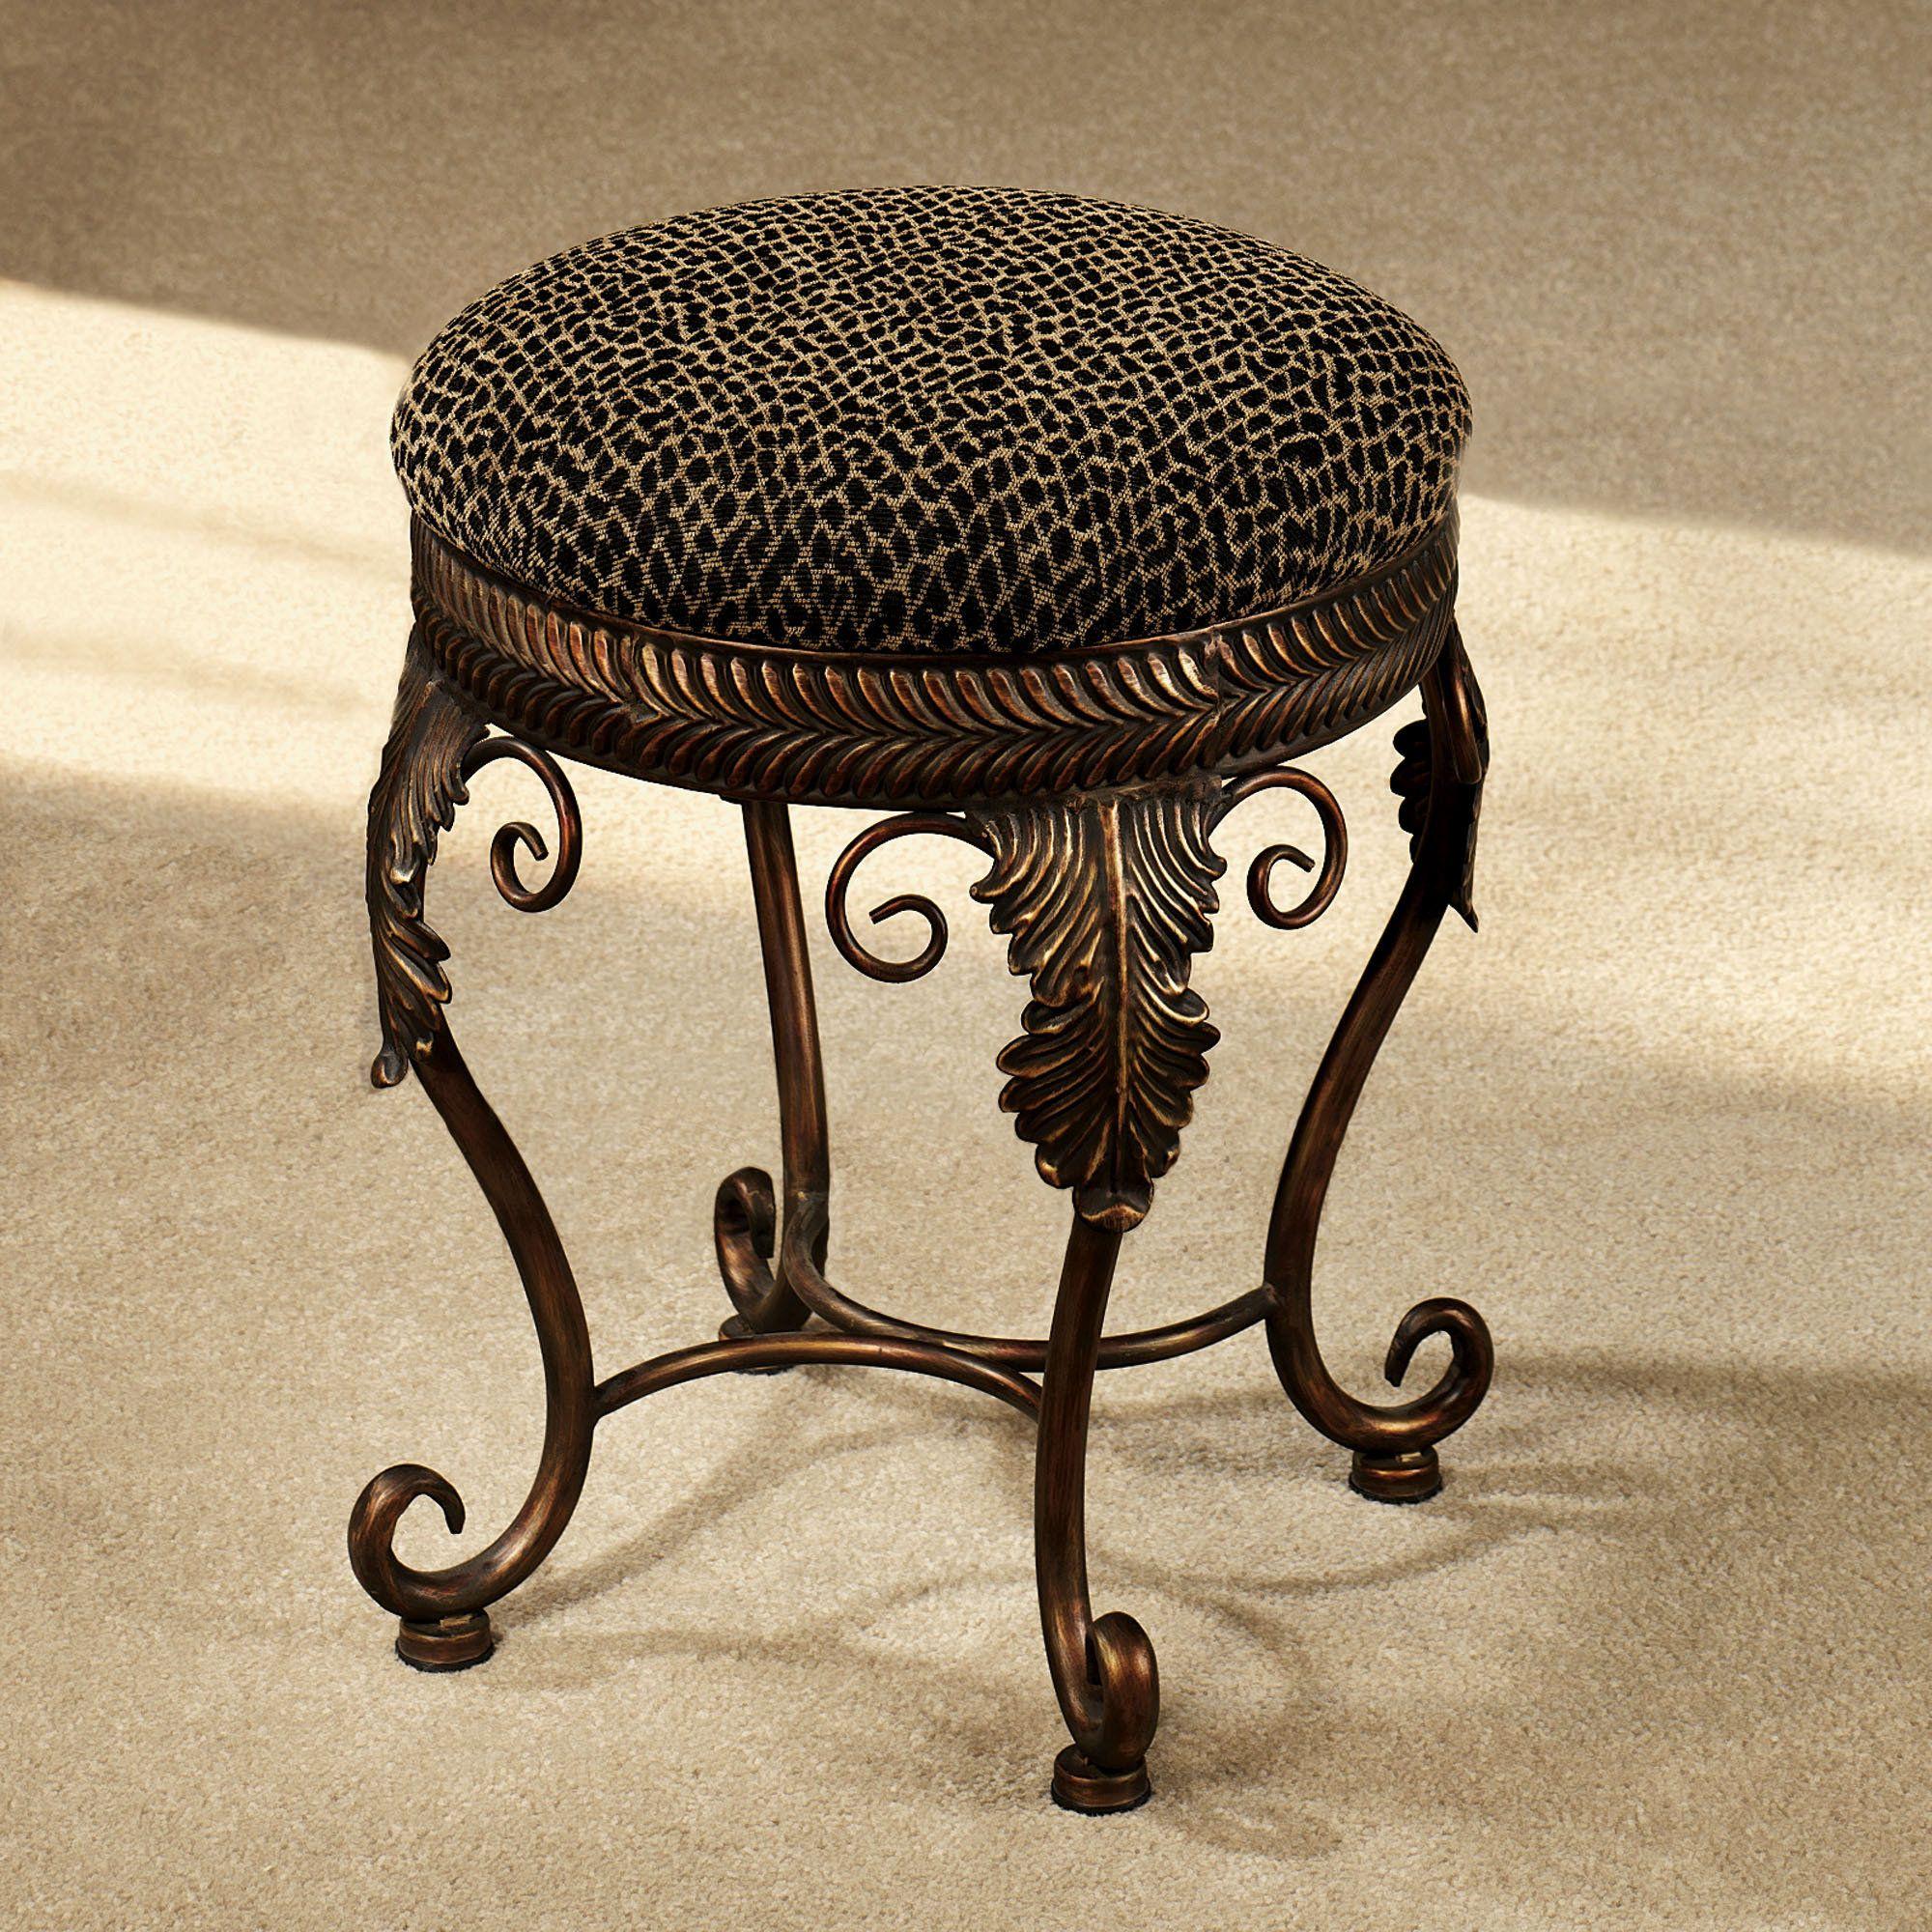 Elegant African Upholstered Bathroom Vanity Chairs Pattern Design With  Copper Leg Design